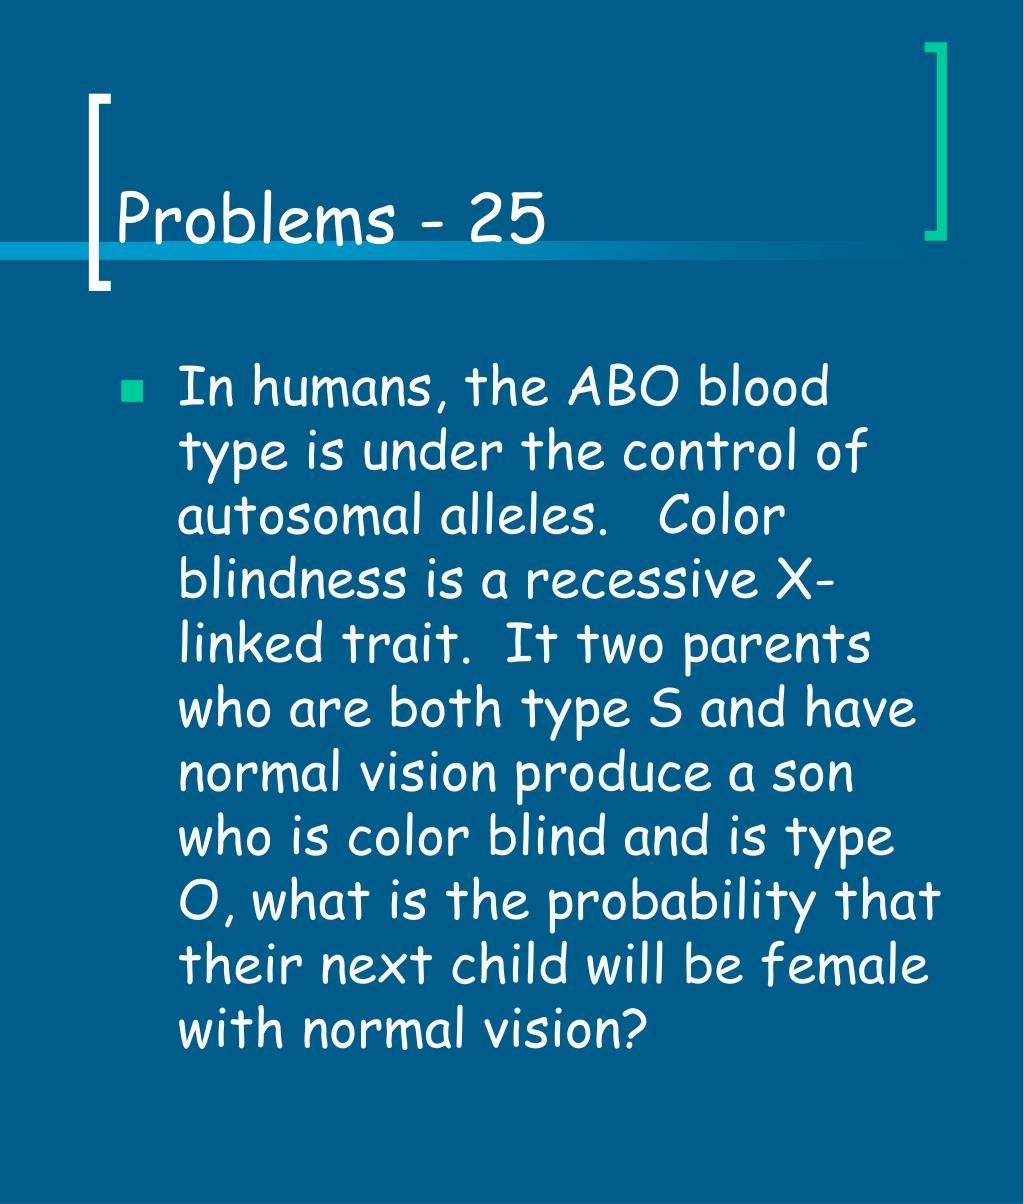 Problems - 25